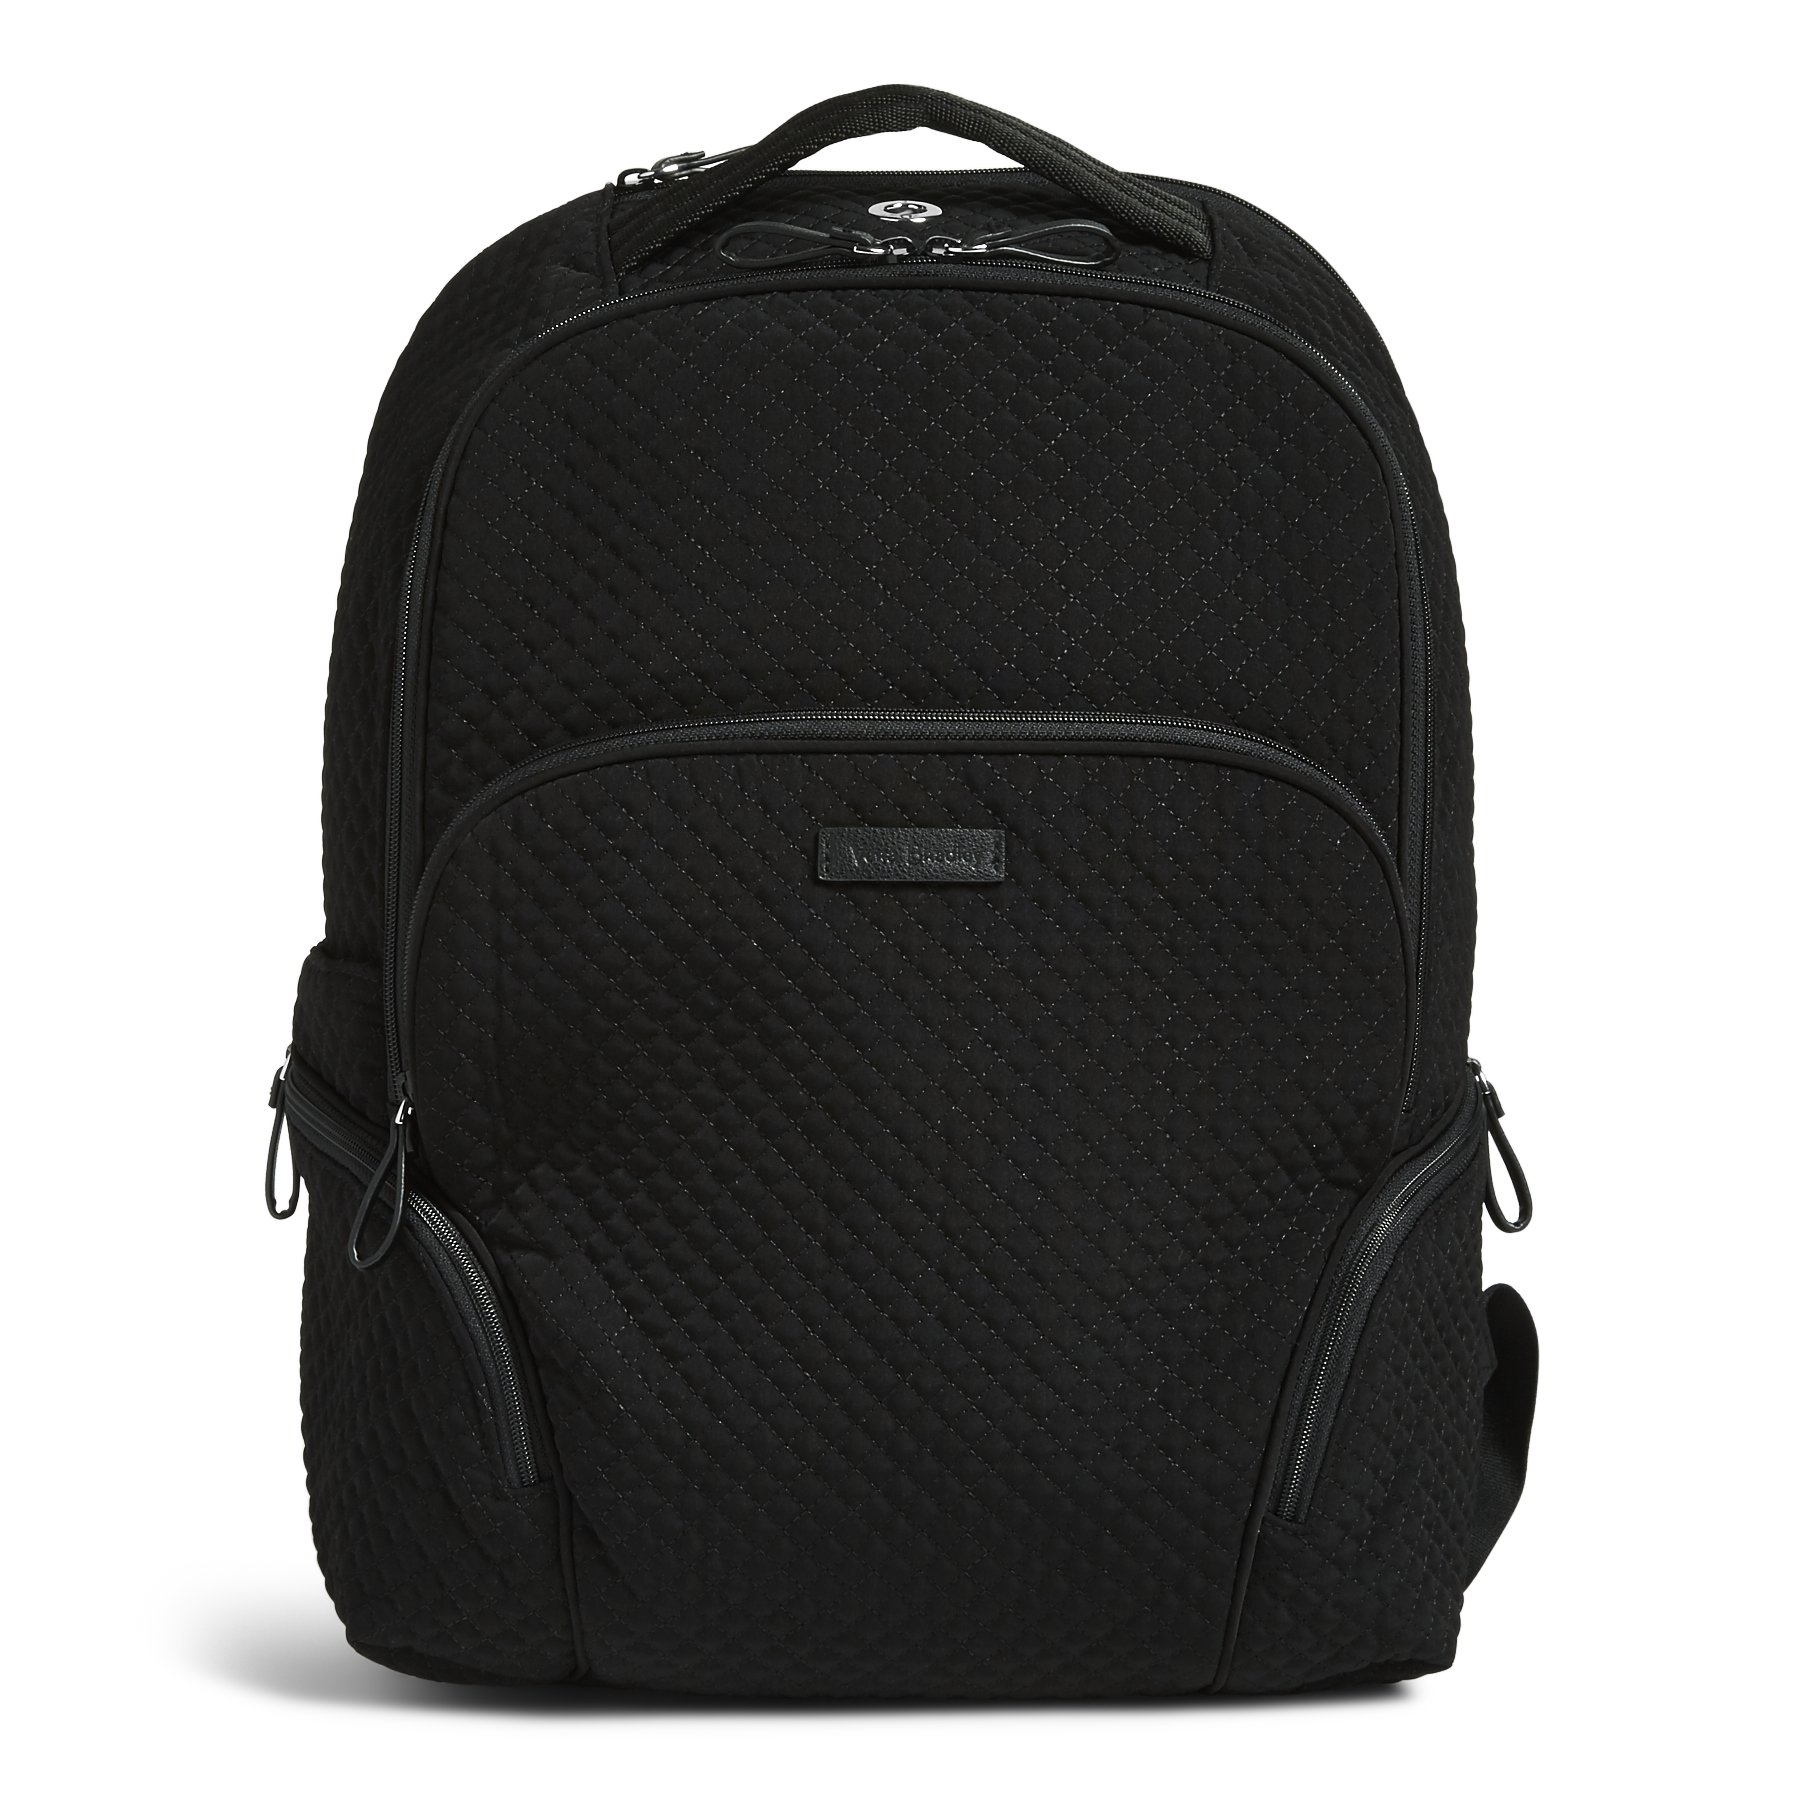 Vera Bradley Iconic Backpack, Microfiber, classic black by Vera Bradley